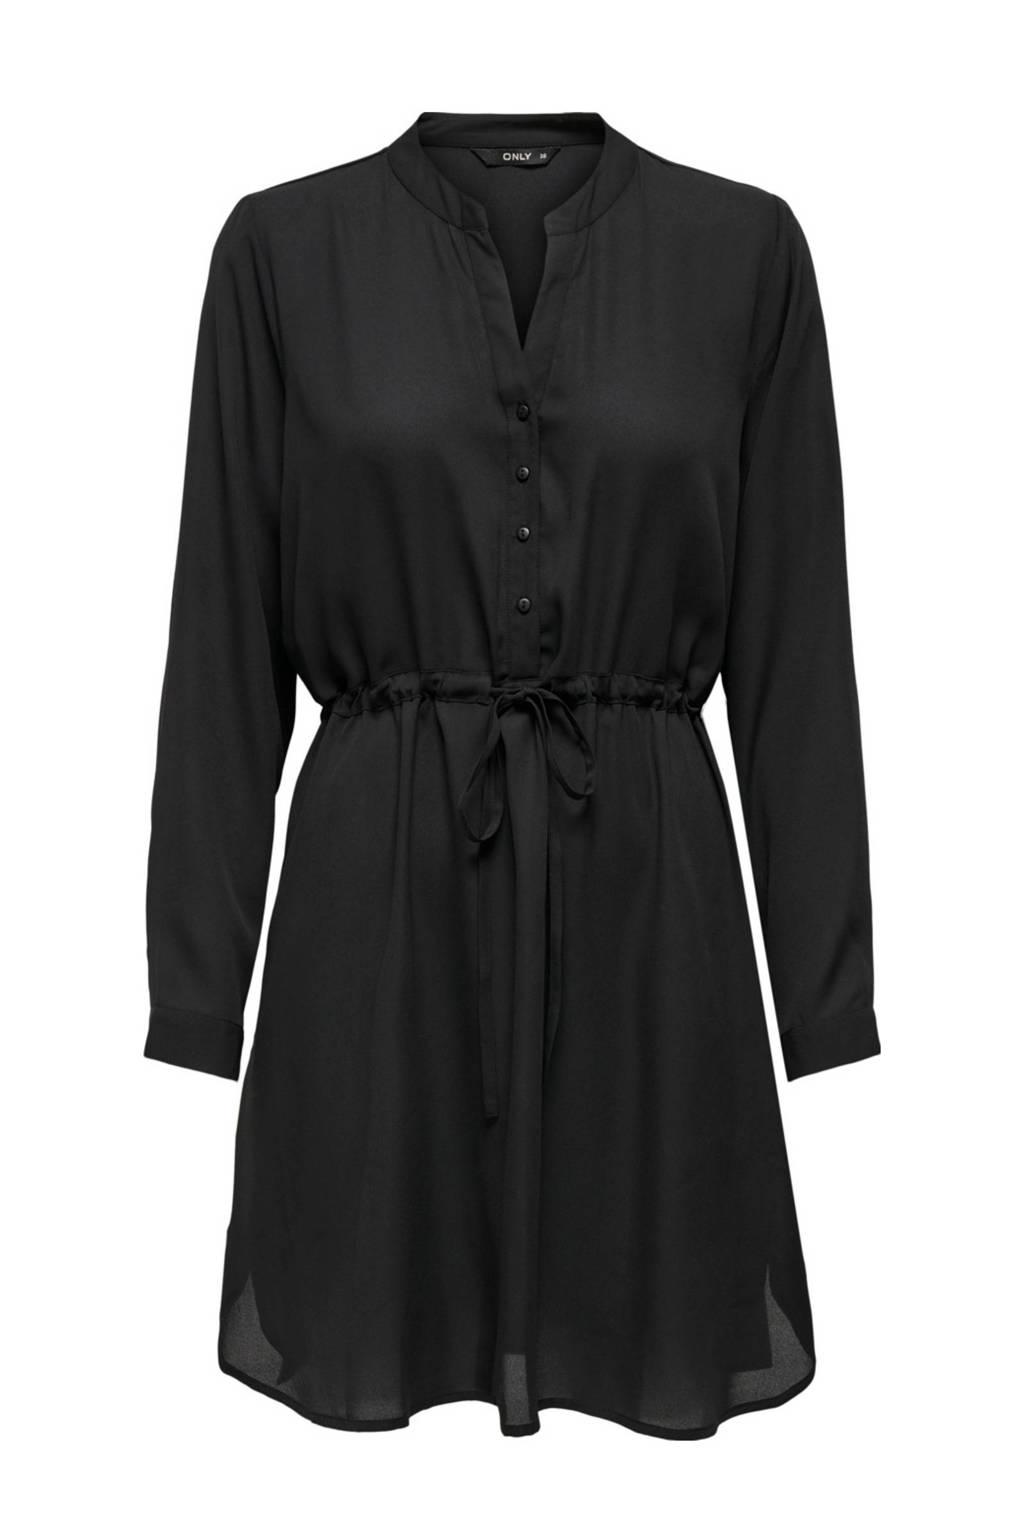 ONLY semi-transparante blousejurk Cory met plooien zwart, Zwart